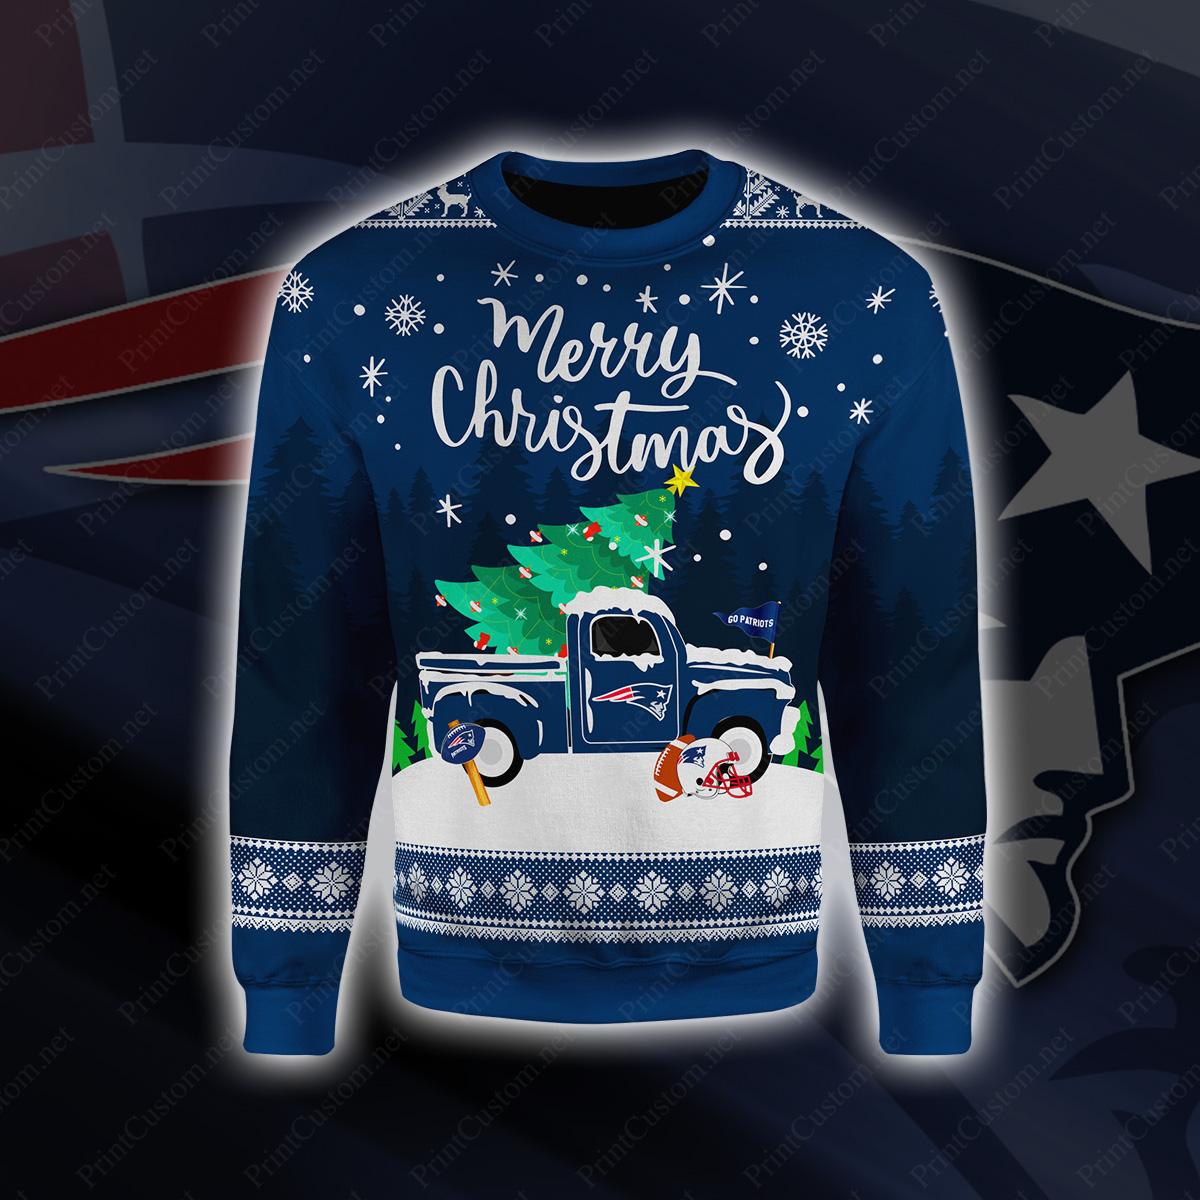 New england patriots merry christmas full printing sweatshirt